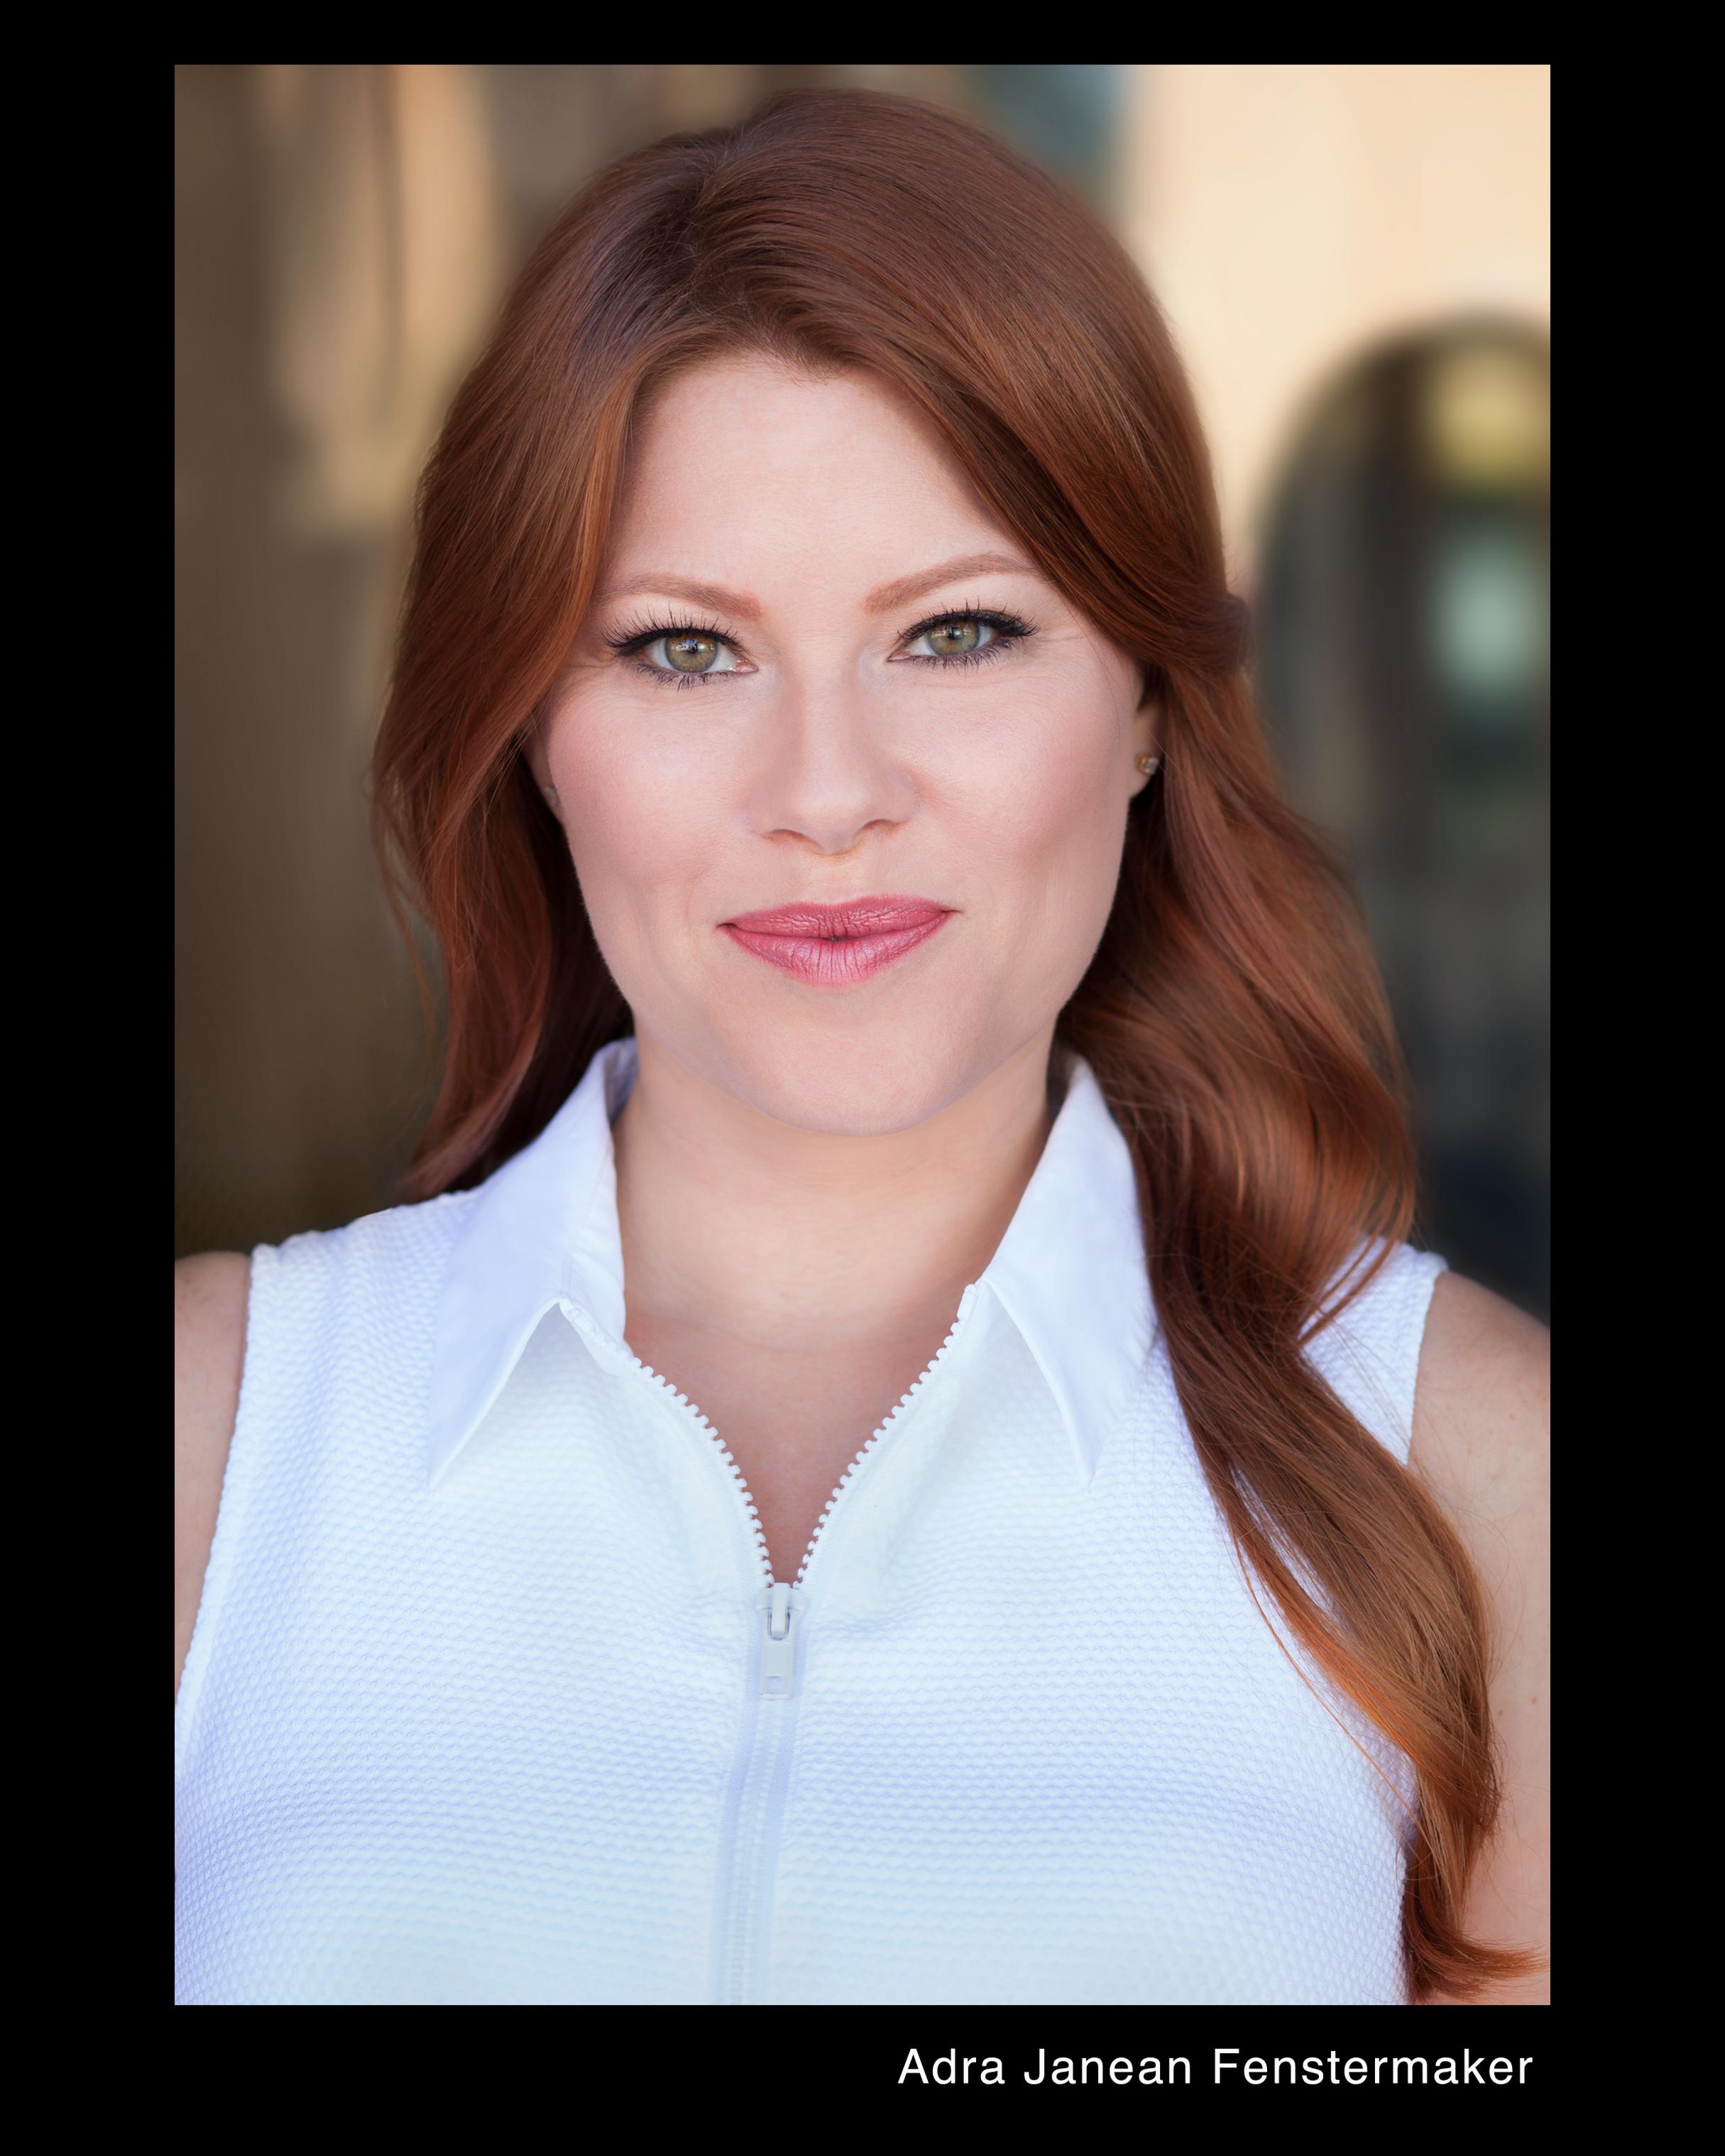 American Actress Adra Janean Fenstermaker